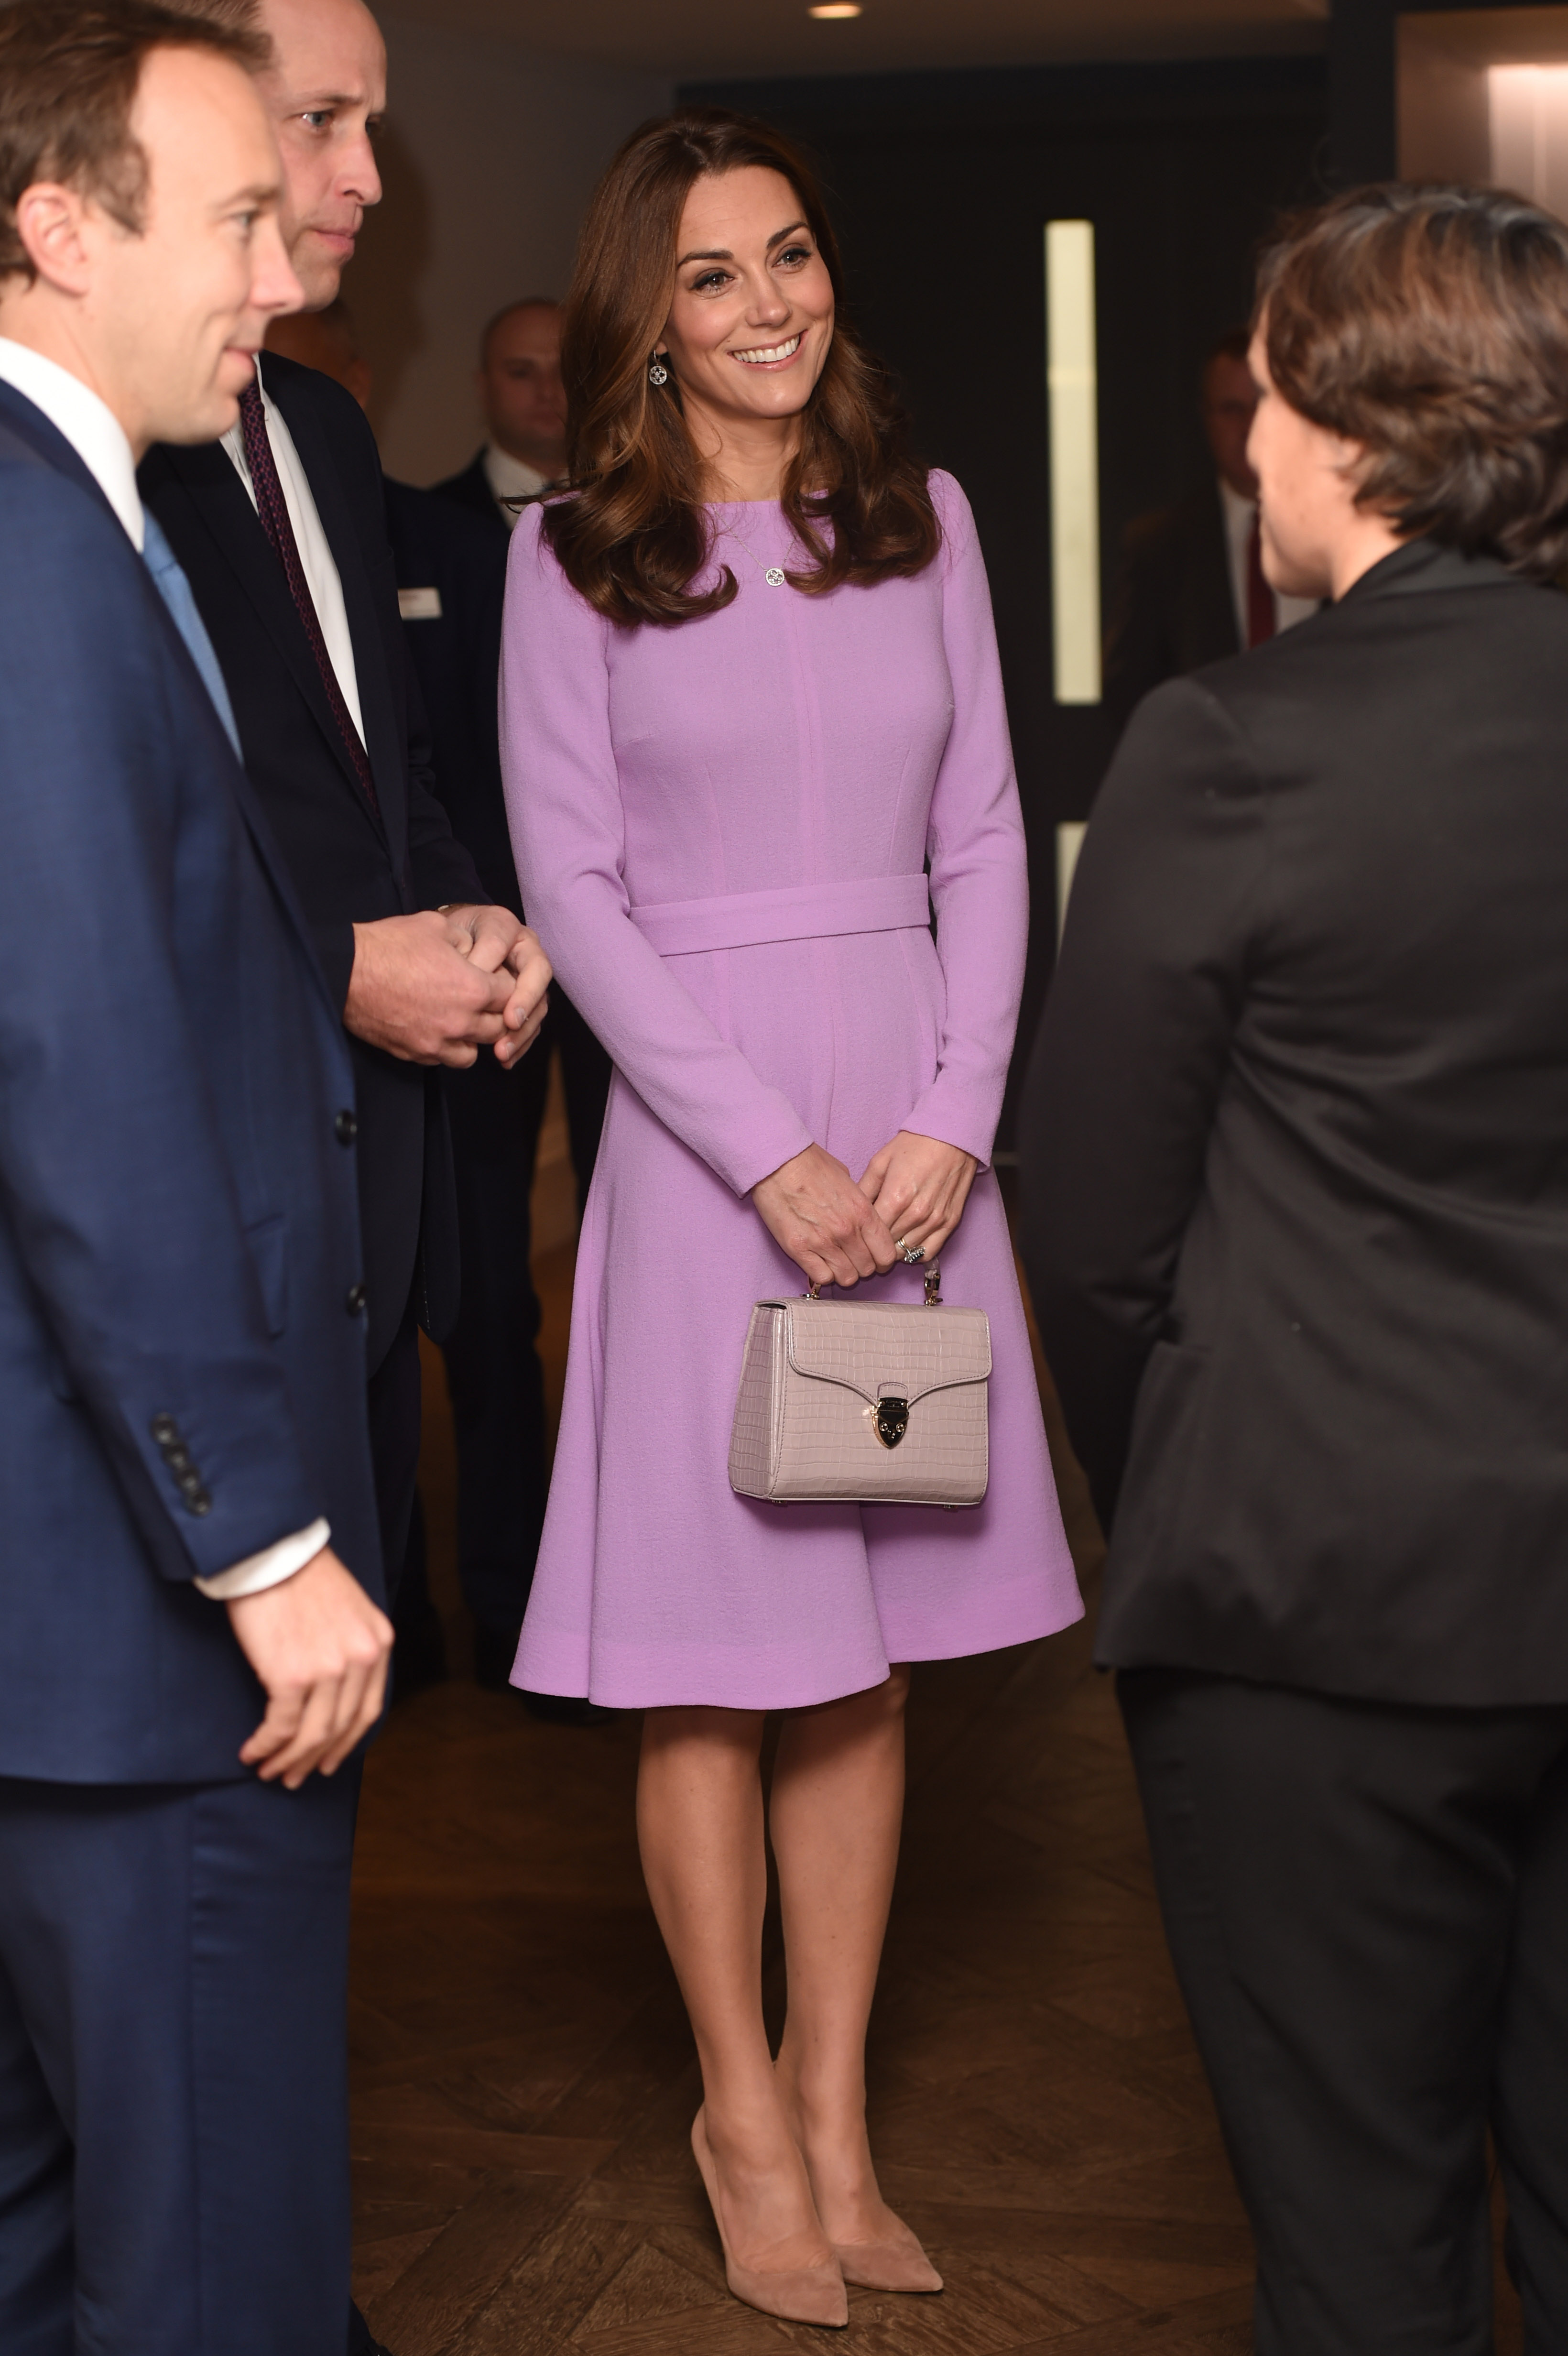 El estilismo de la duquesa. (Getty Images)